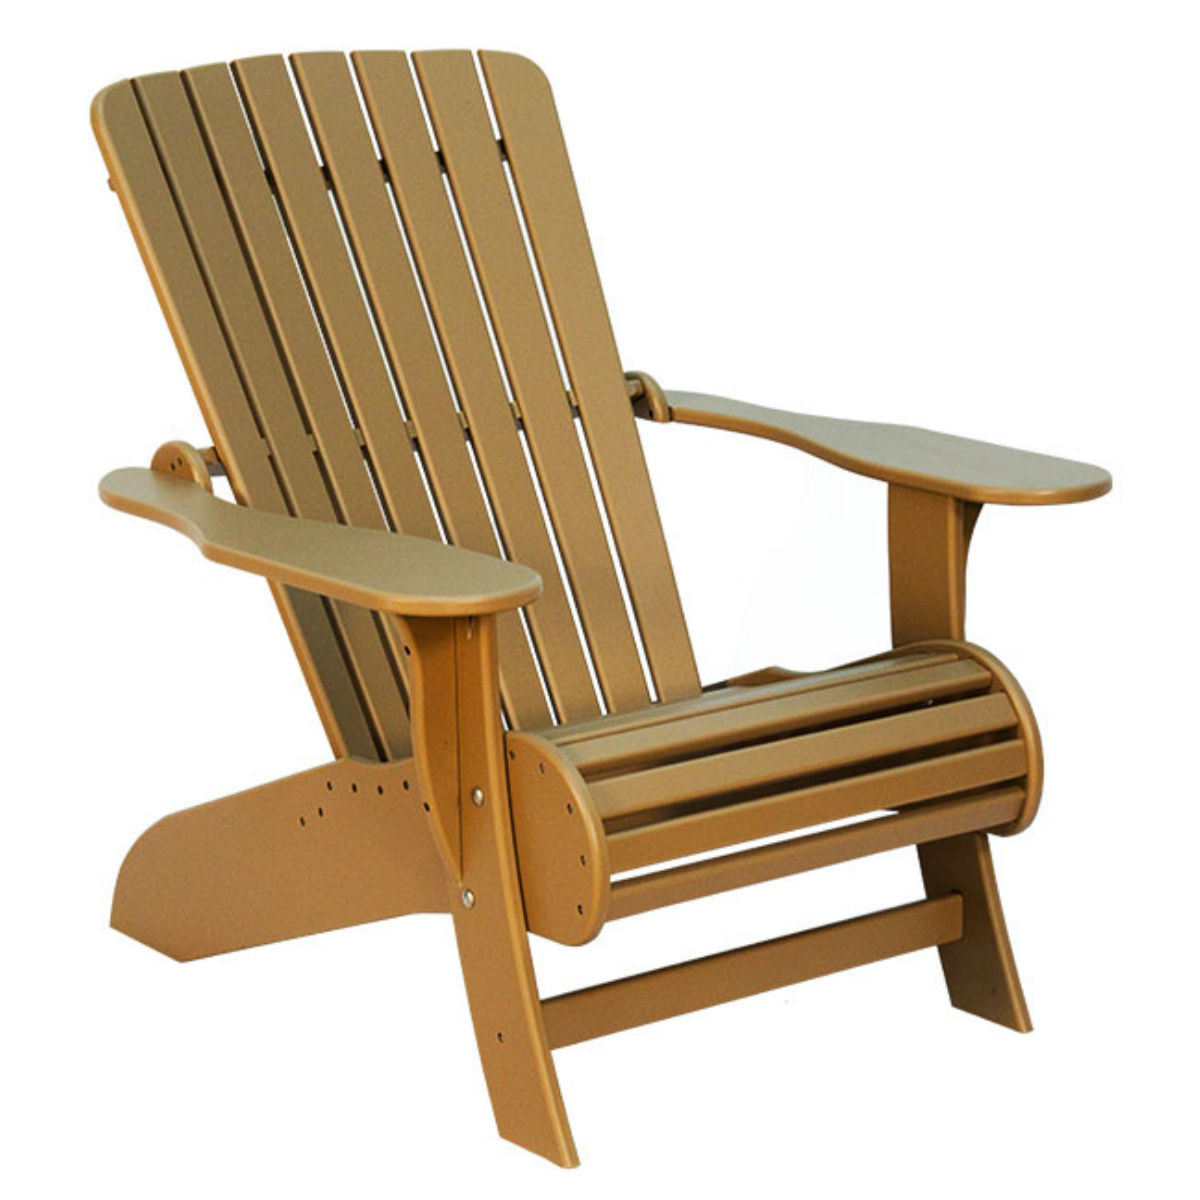 Highlander Muskoka Chair  Traditional Adirondack Chair